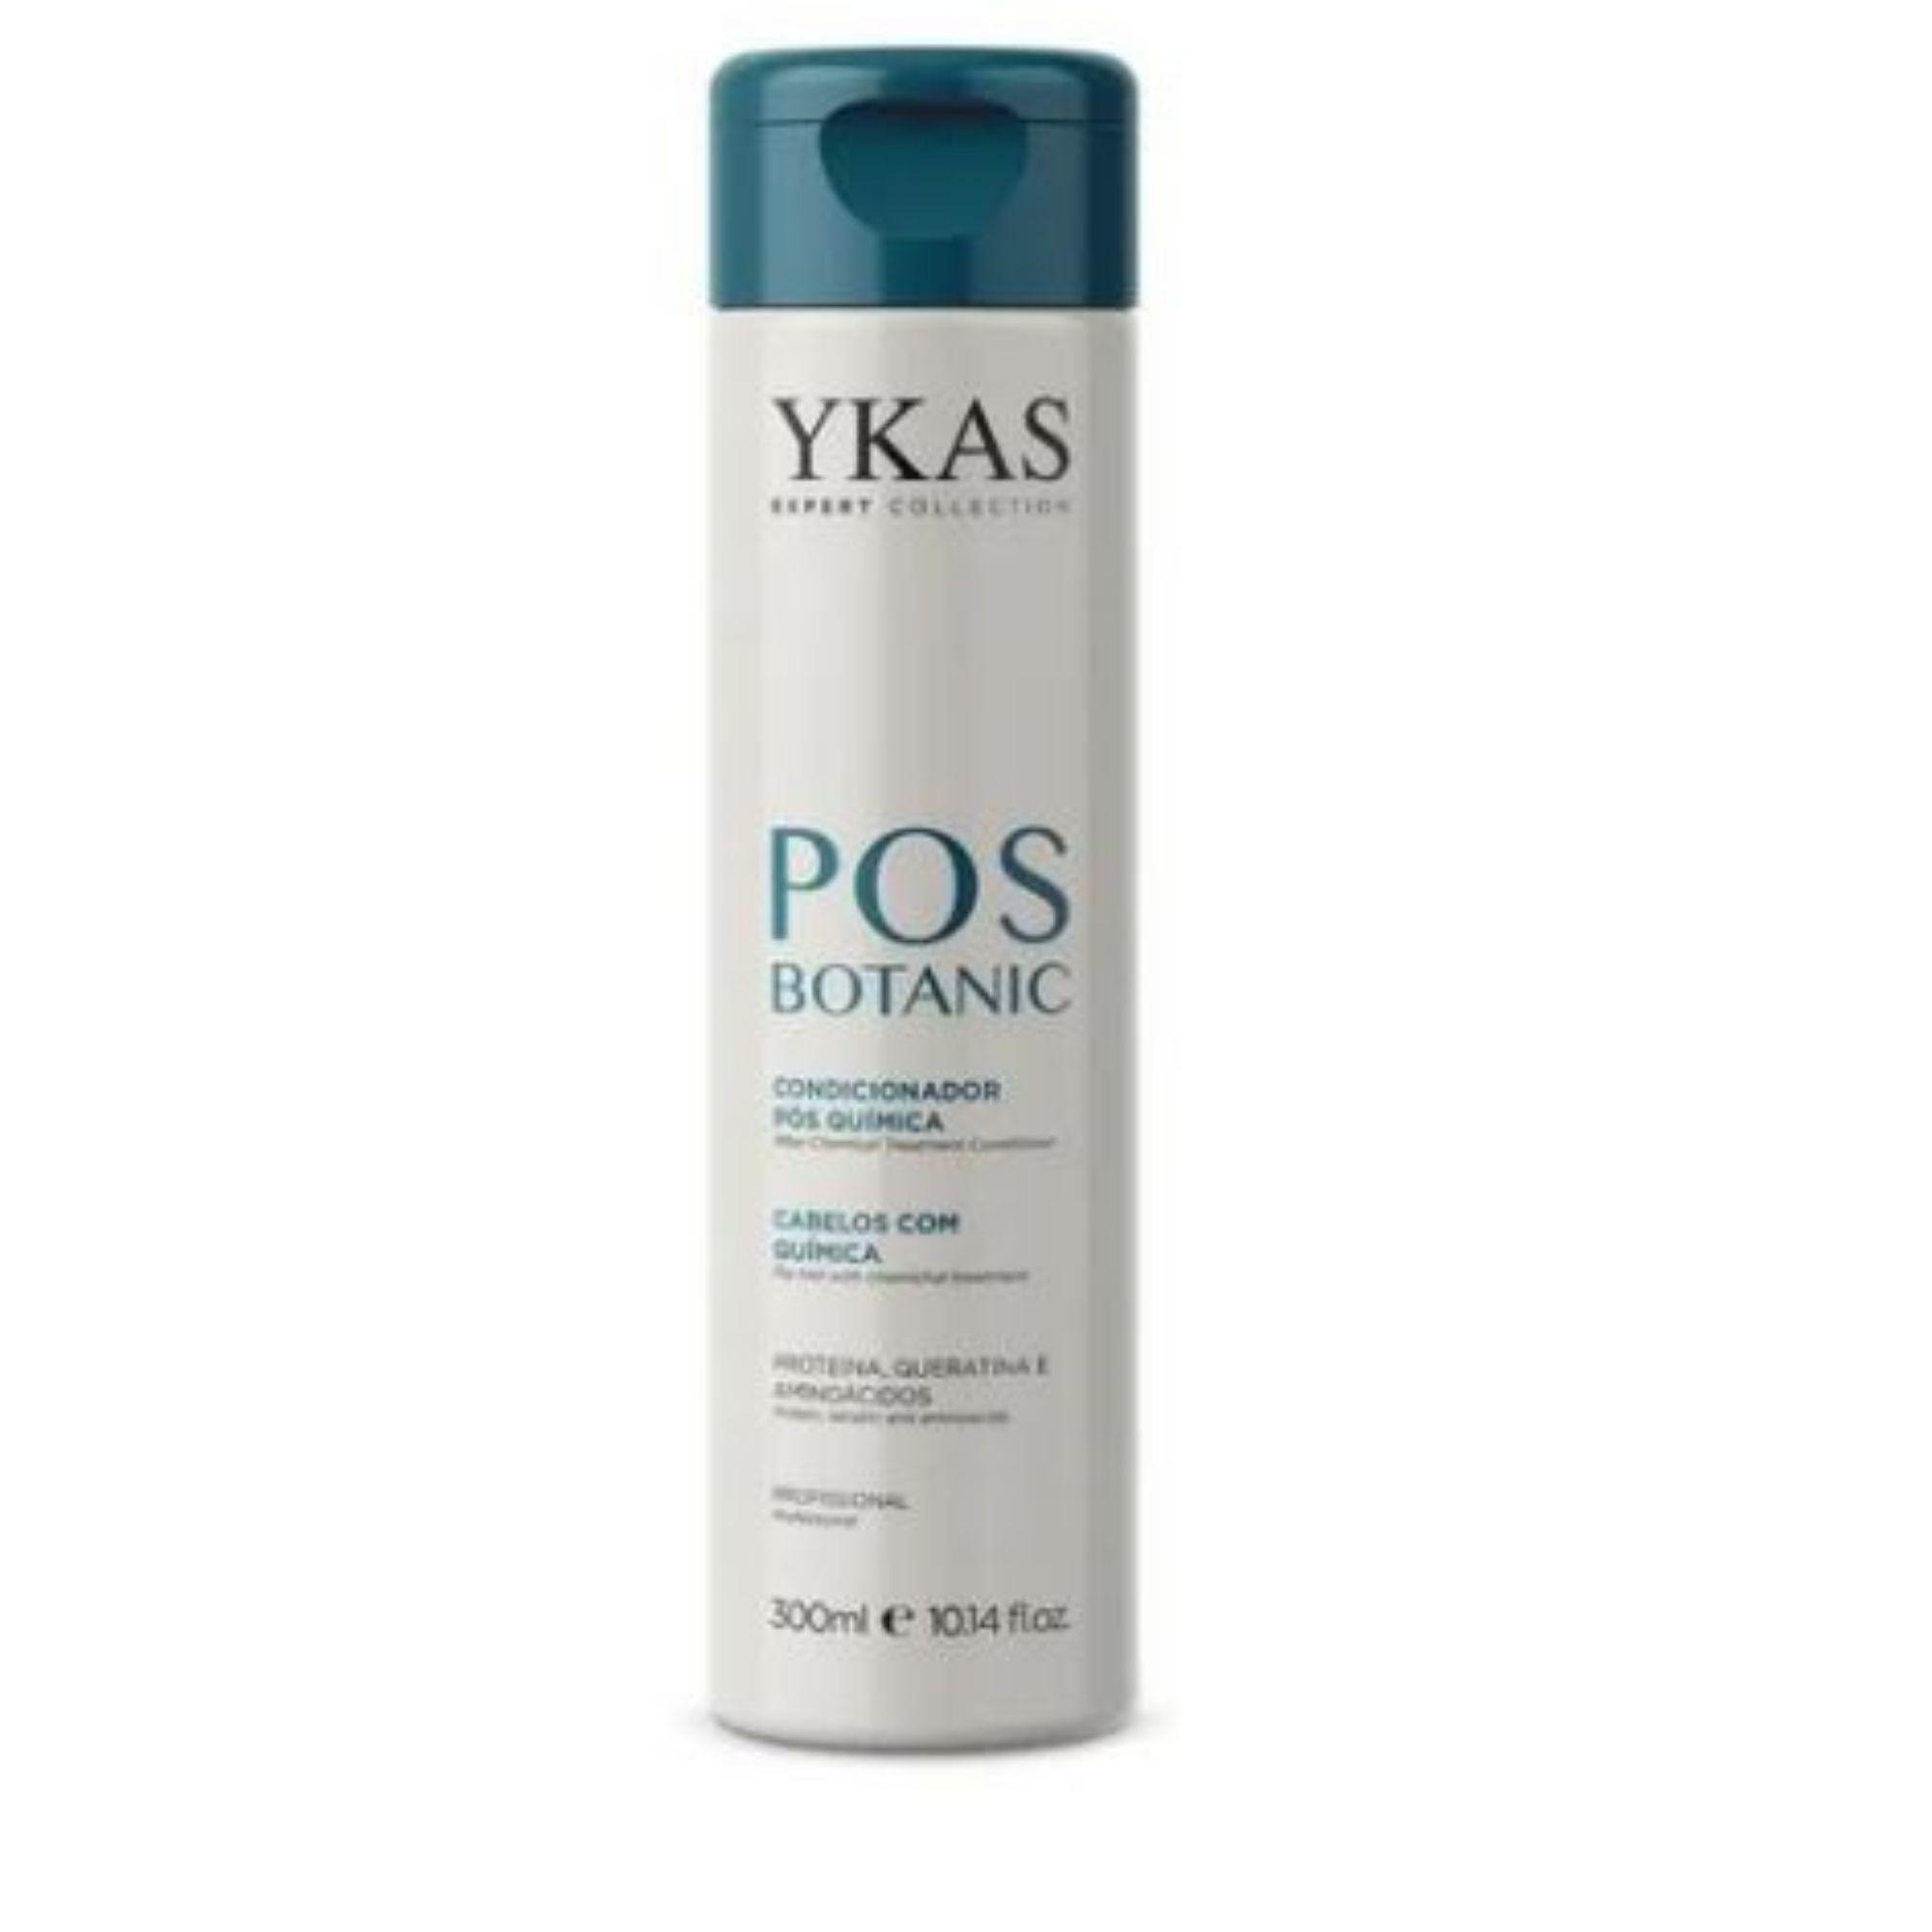 Ykas Botanic Condicionador  Pós Quimica 300ml